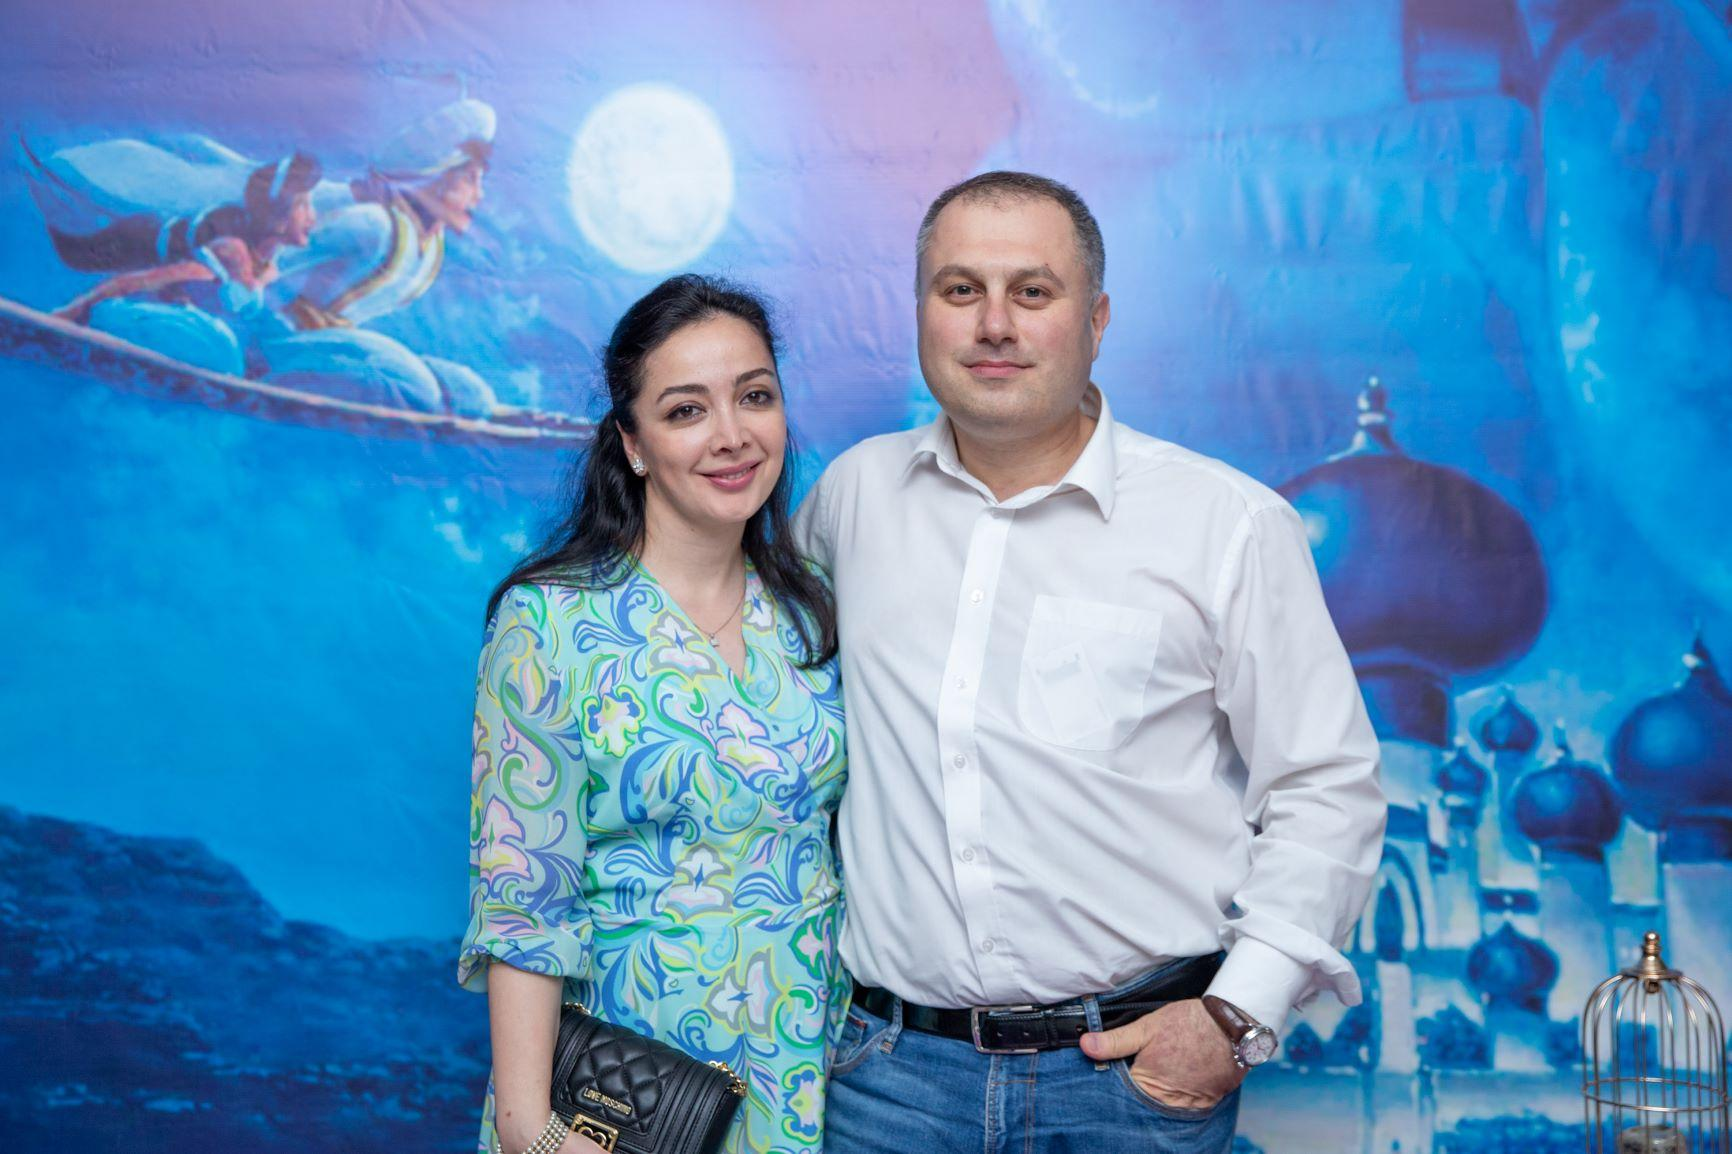 Уилл Смит как джинн исполнил желания азербайджанцев (ВИДЕО, ФОТО) - Gallery Image